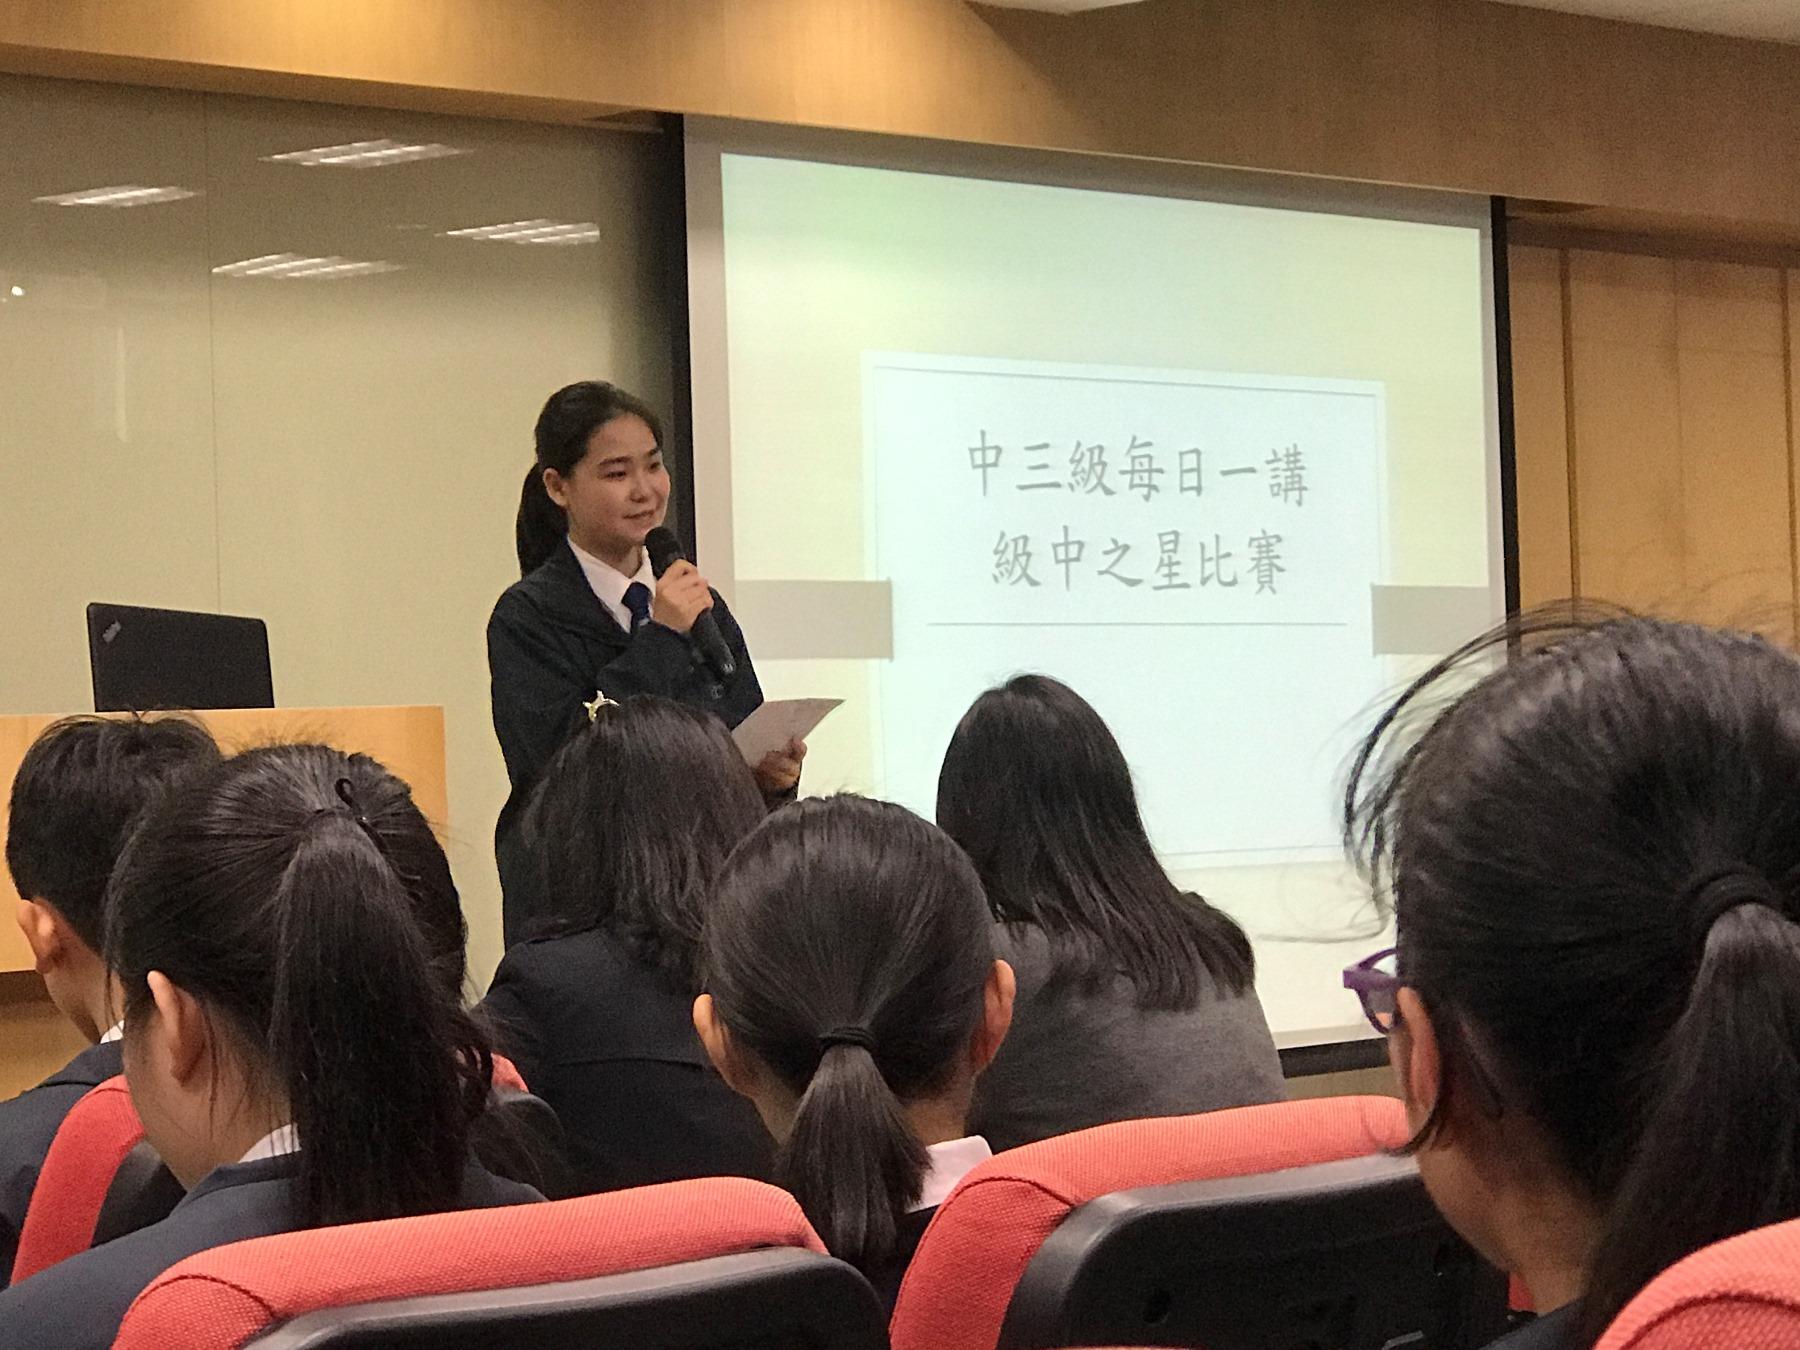 http://npc.edu.hk/sites/default/files/img_2218.jpg